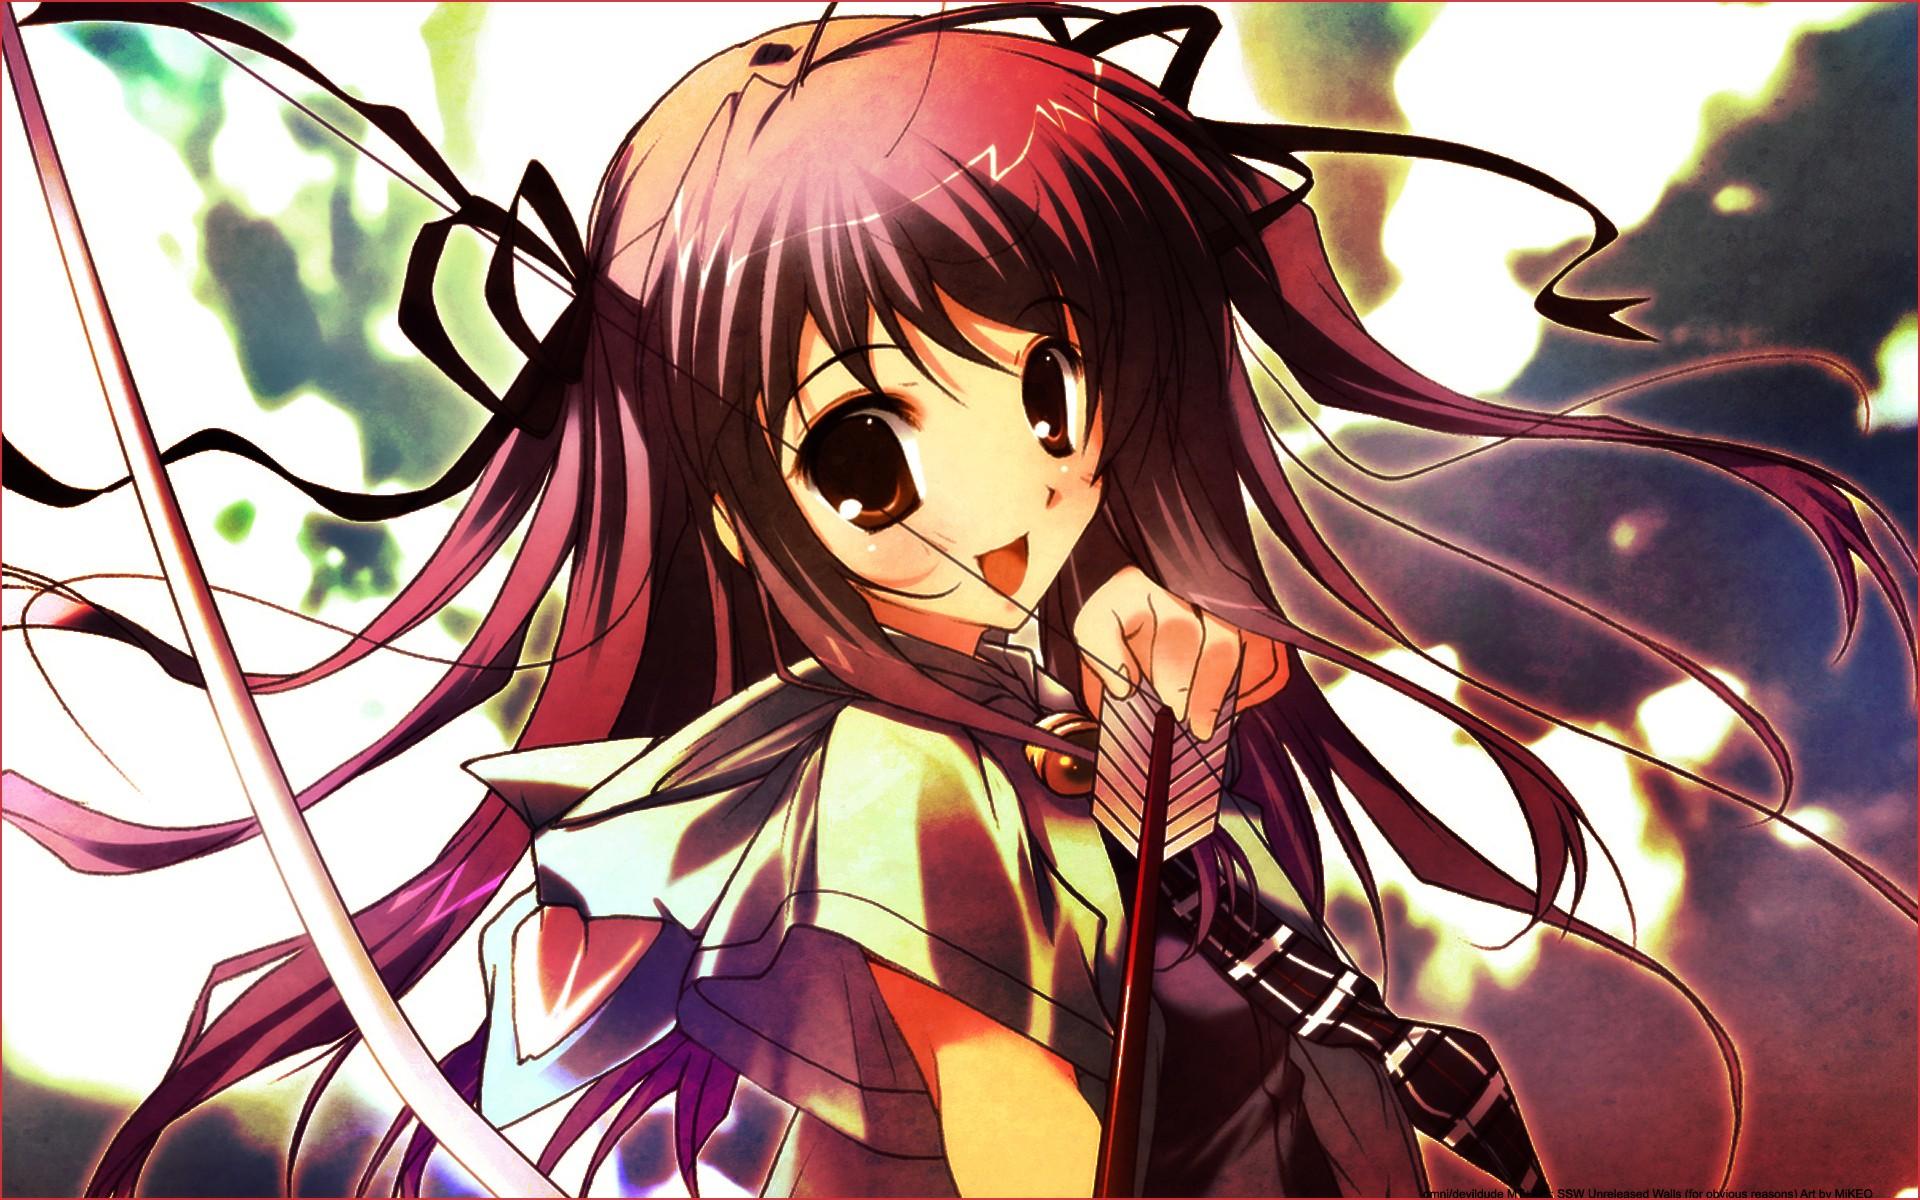 Anime 1920x1200 anime anime girls archer Arrow bow fantasy art fantasy girl dark hair open mouth